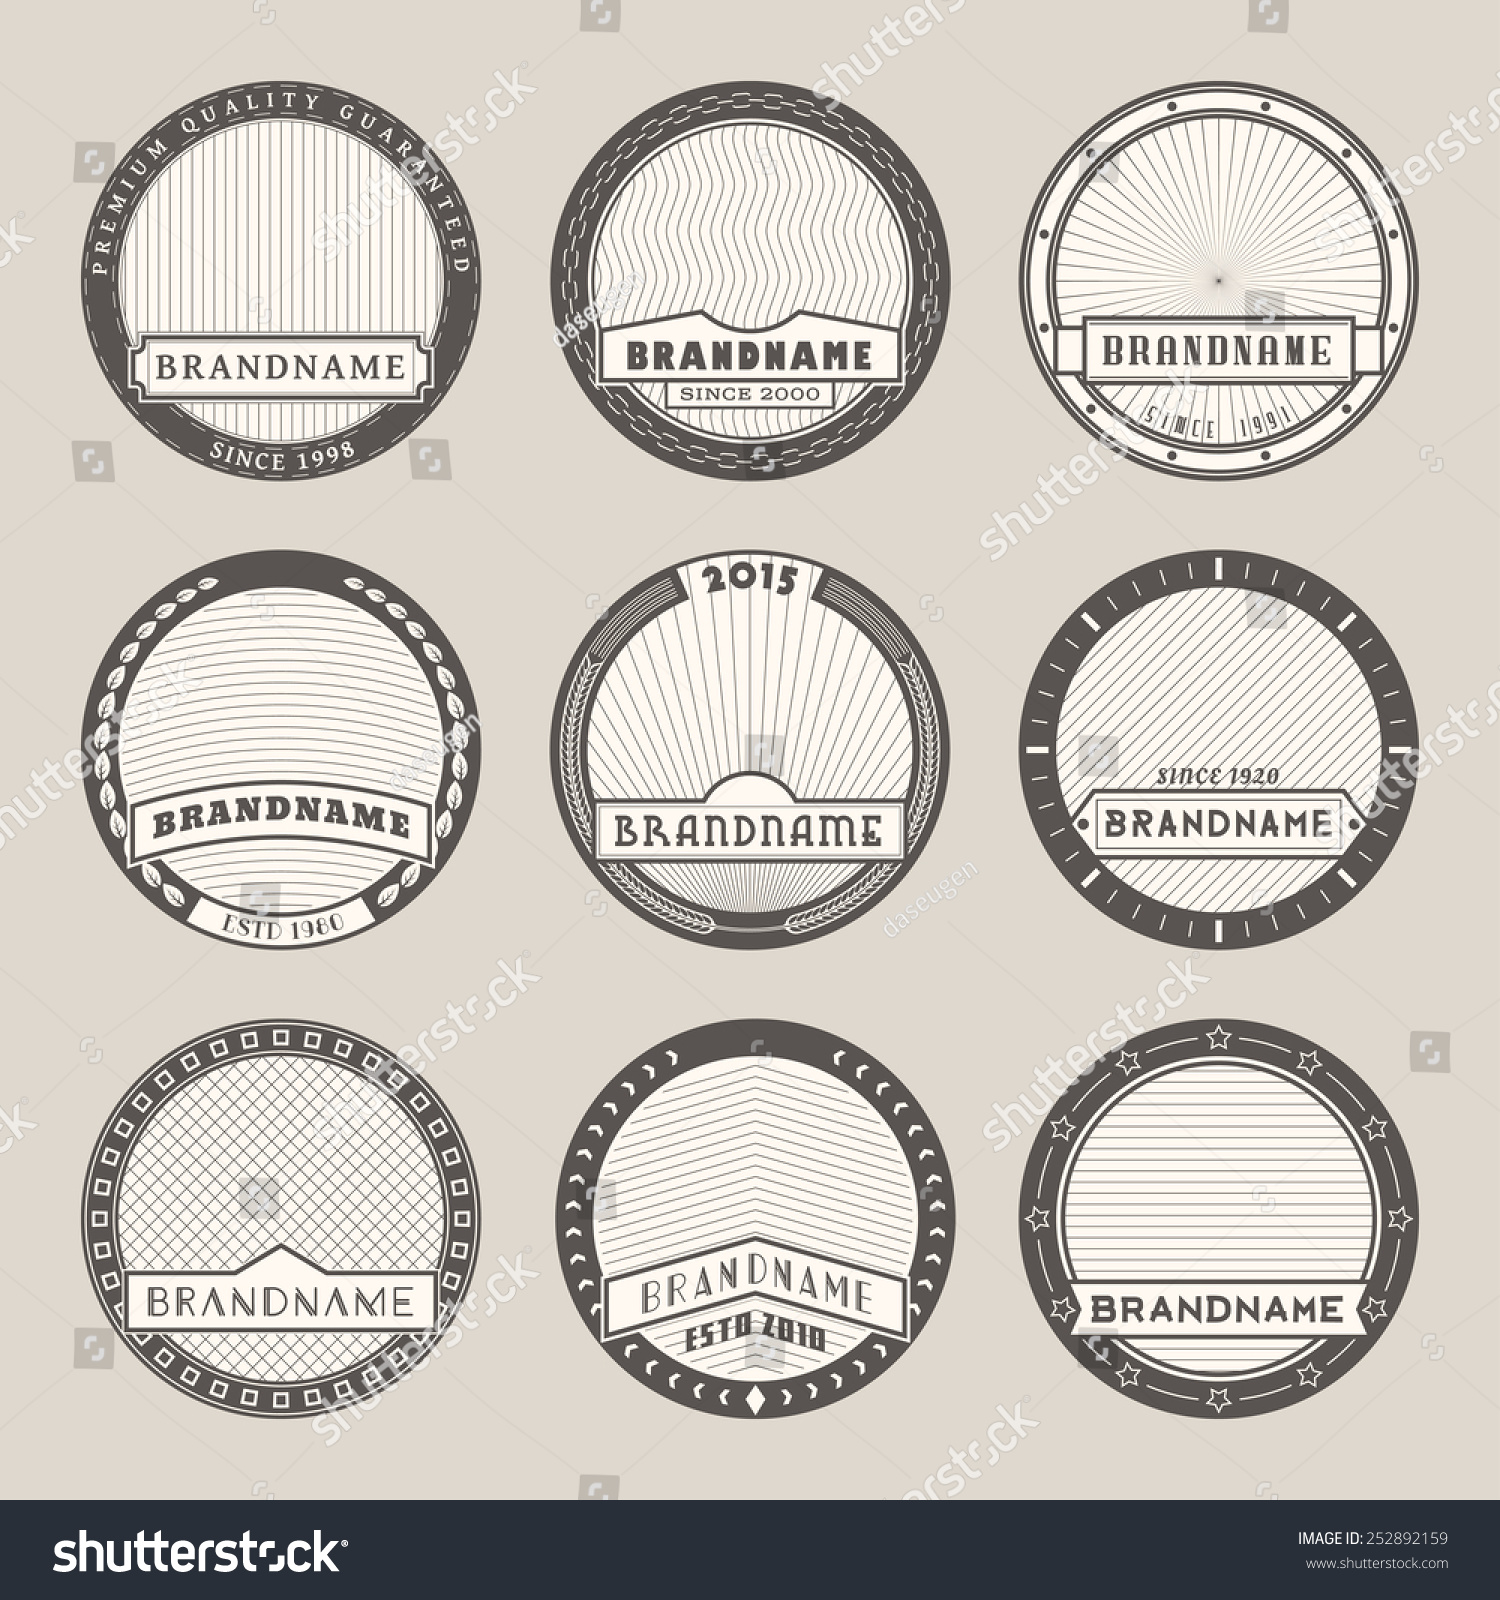 set vector round label templateslogotypes badges stock vector 252892159 shutterstock. Black Bedroom Furniture Sets. Home Design Ideas